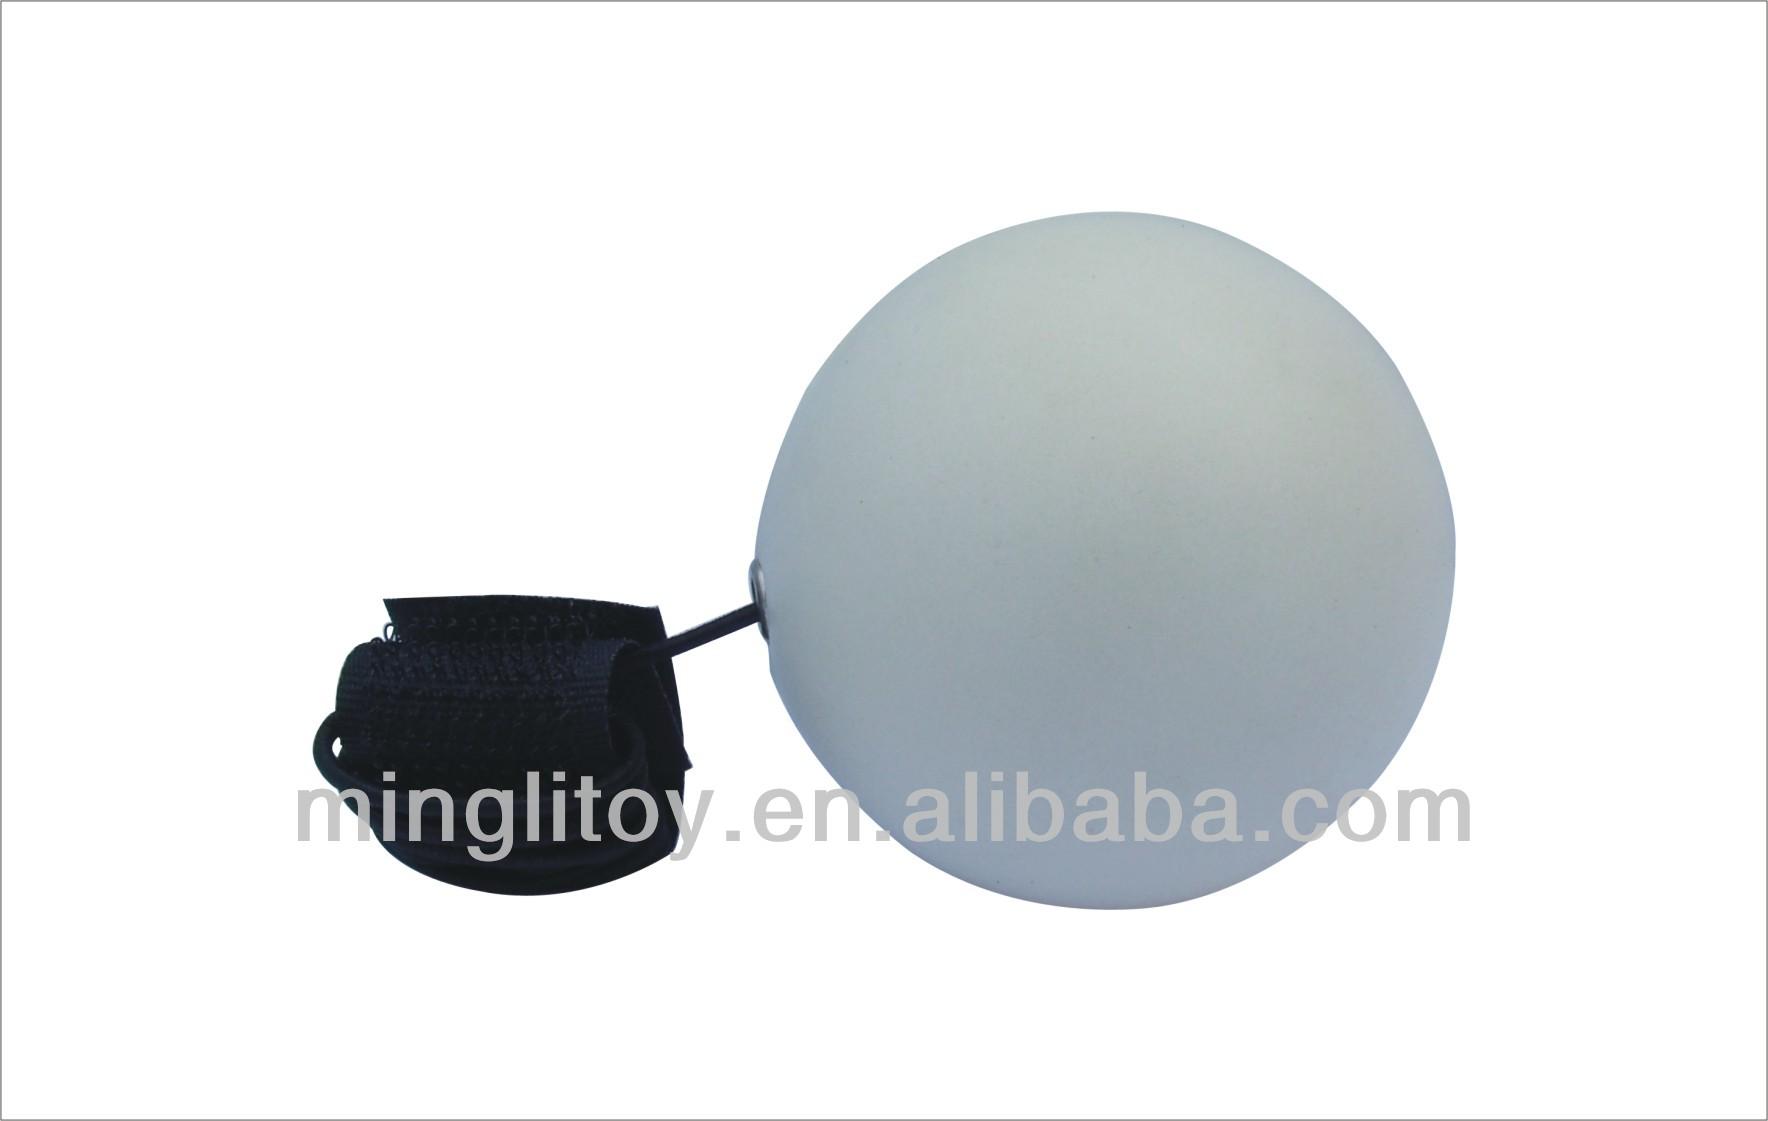 Squishy Yoyo Ball : Customized Pu Yoyo And Bowling/ Soft Stress Ball - Buy Stress Ball,Pu Toy,Stress Ball Product on ...